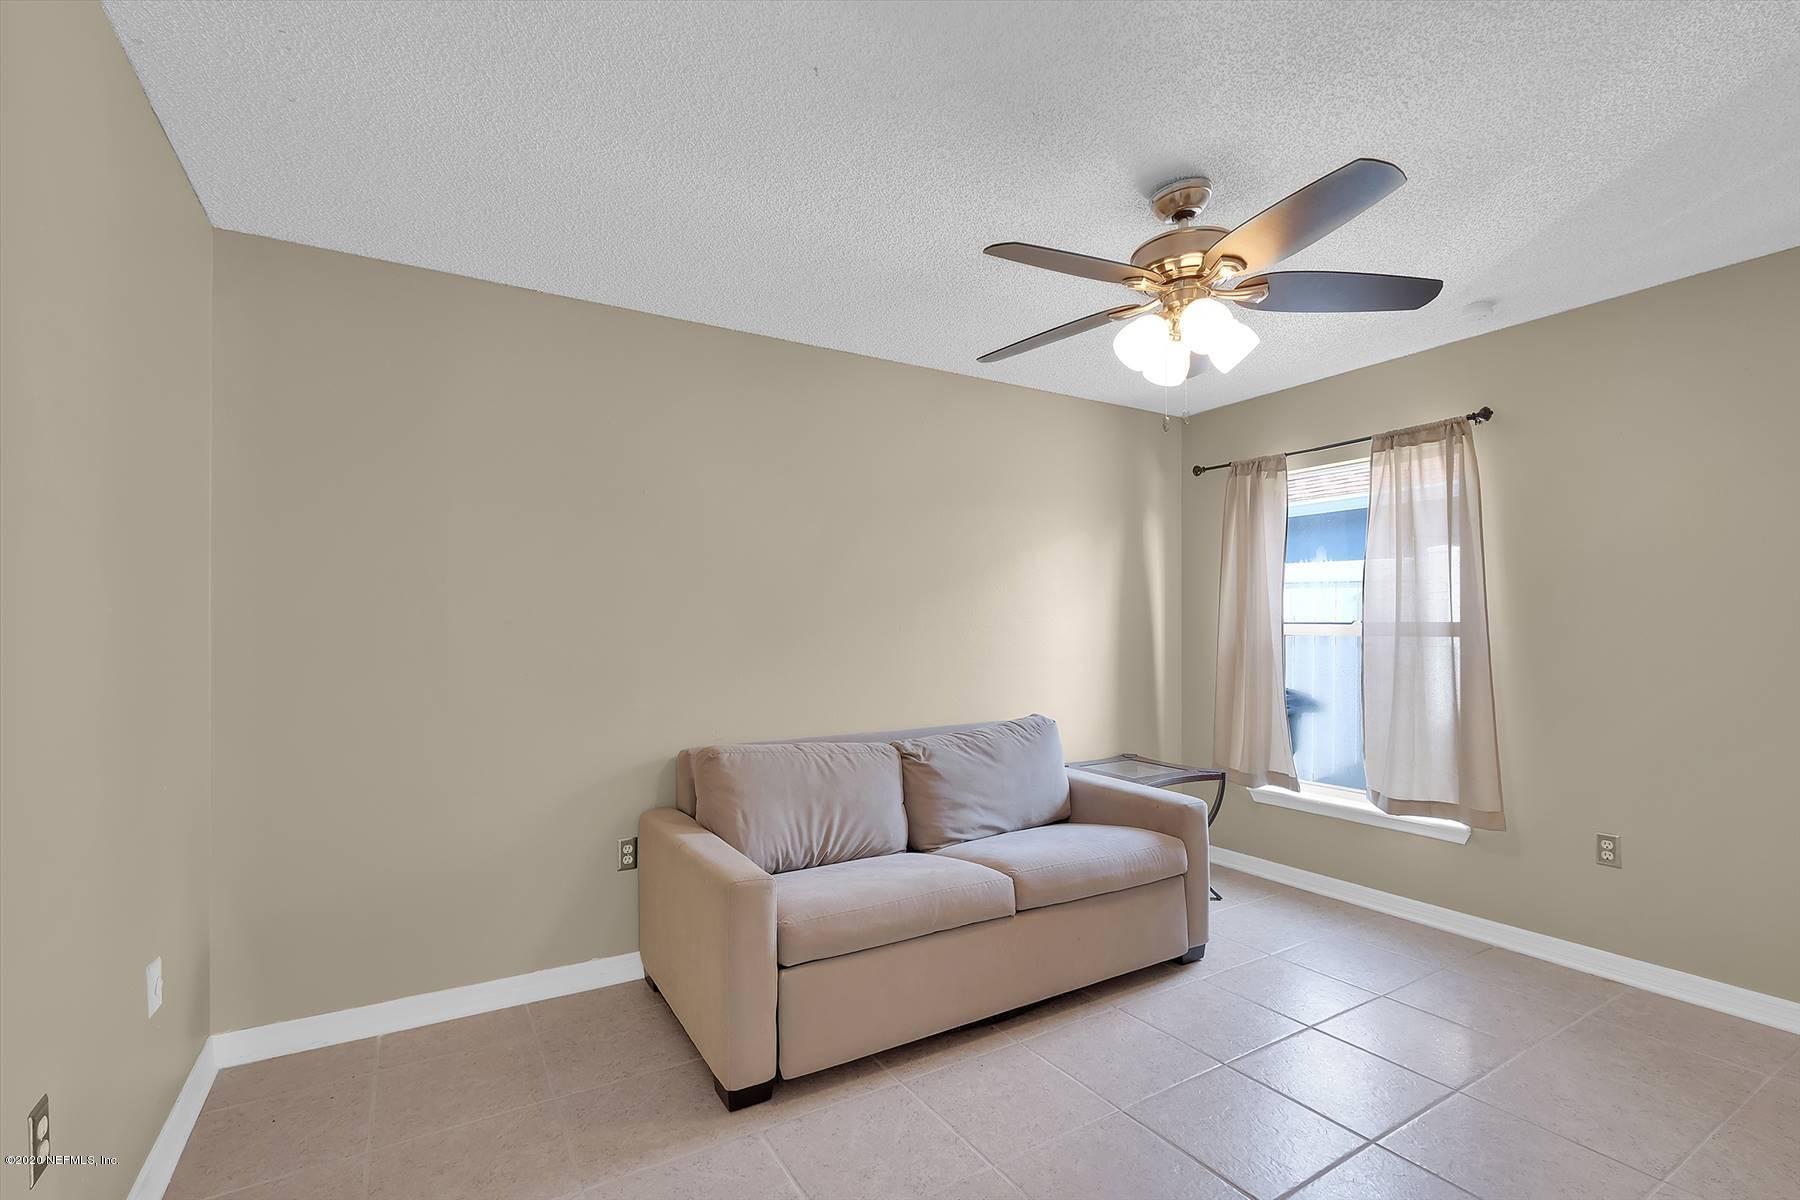 1622 HUDDERFIELD, JACKSONVILLE, FLORIDA 32246, 3 Bedrooms Bedrooms, ,2 BathroomsBathrooms,Residential,For sale,HUDDERFIELD,1040687